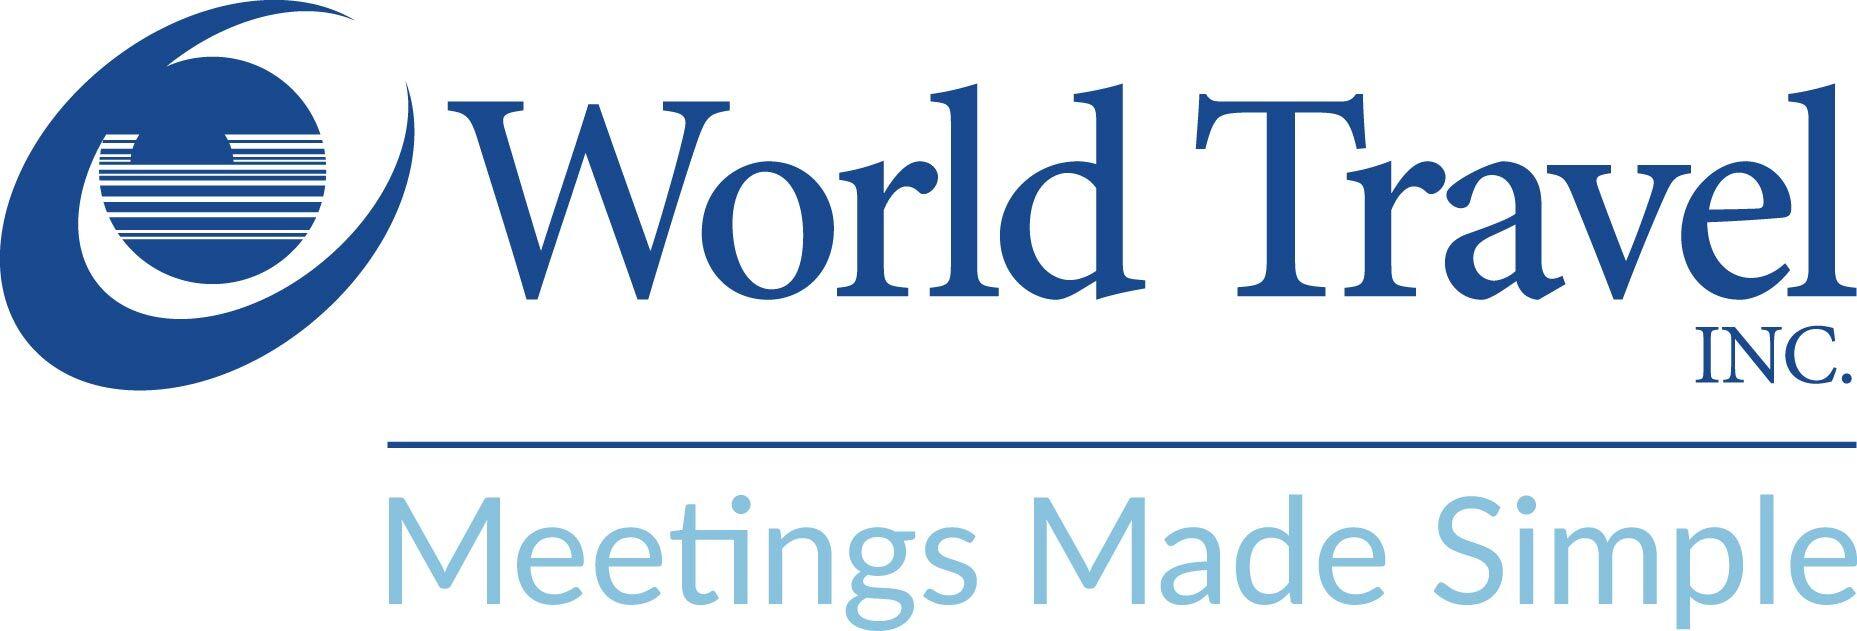 World Travel Inc Global Meetings Events